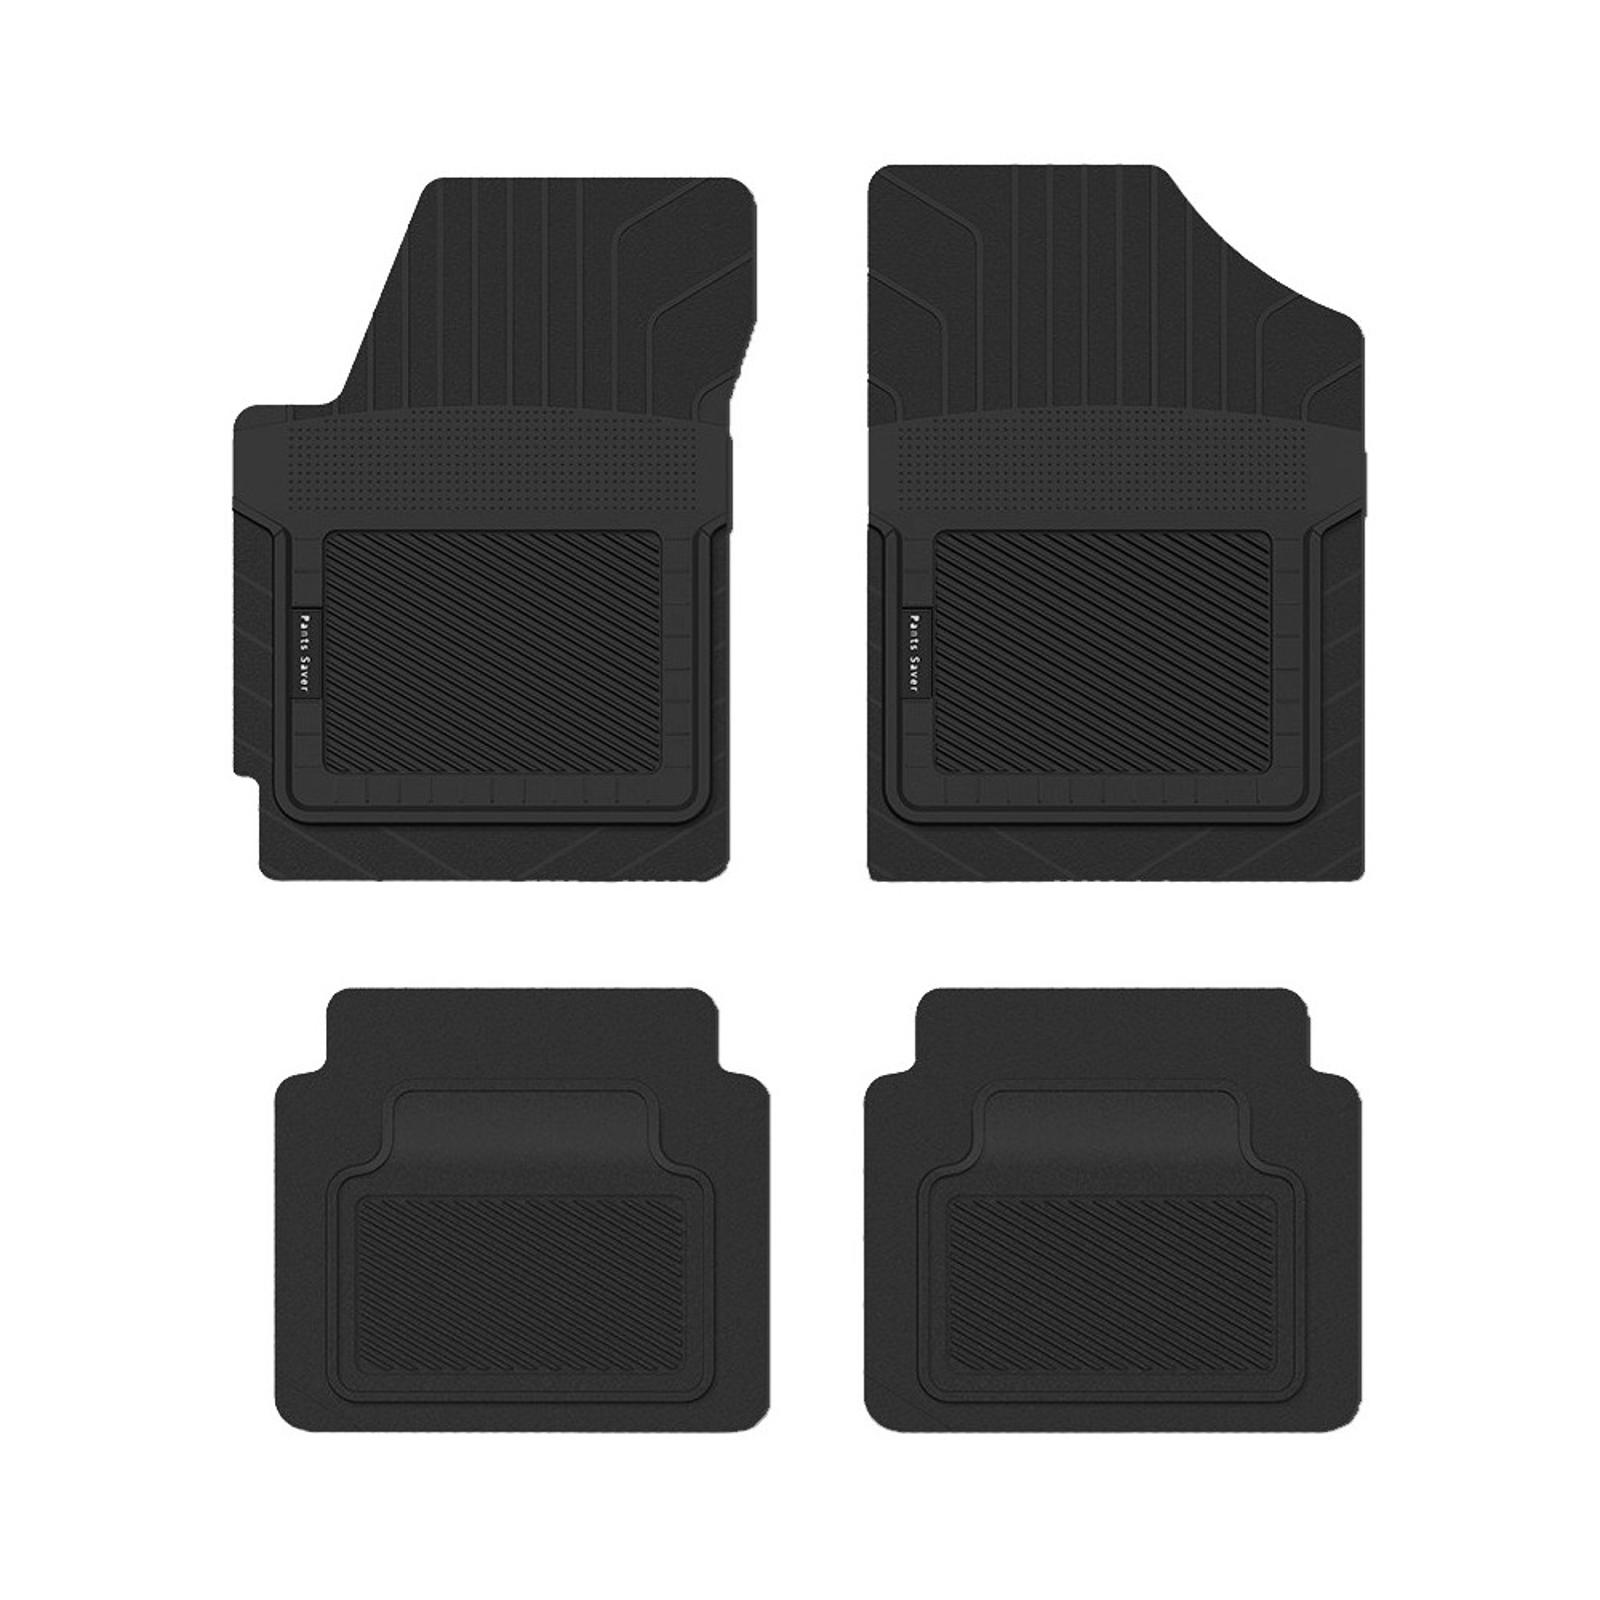 Koolatron Pants Saver Custom Fit Car Mat 4PC Mini Cooper Clubman 2016 Gray PartNumber: 02801715000P KsnValue: 02801715000 MfgPartNumber: 2703162